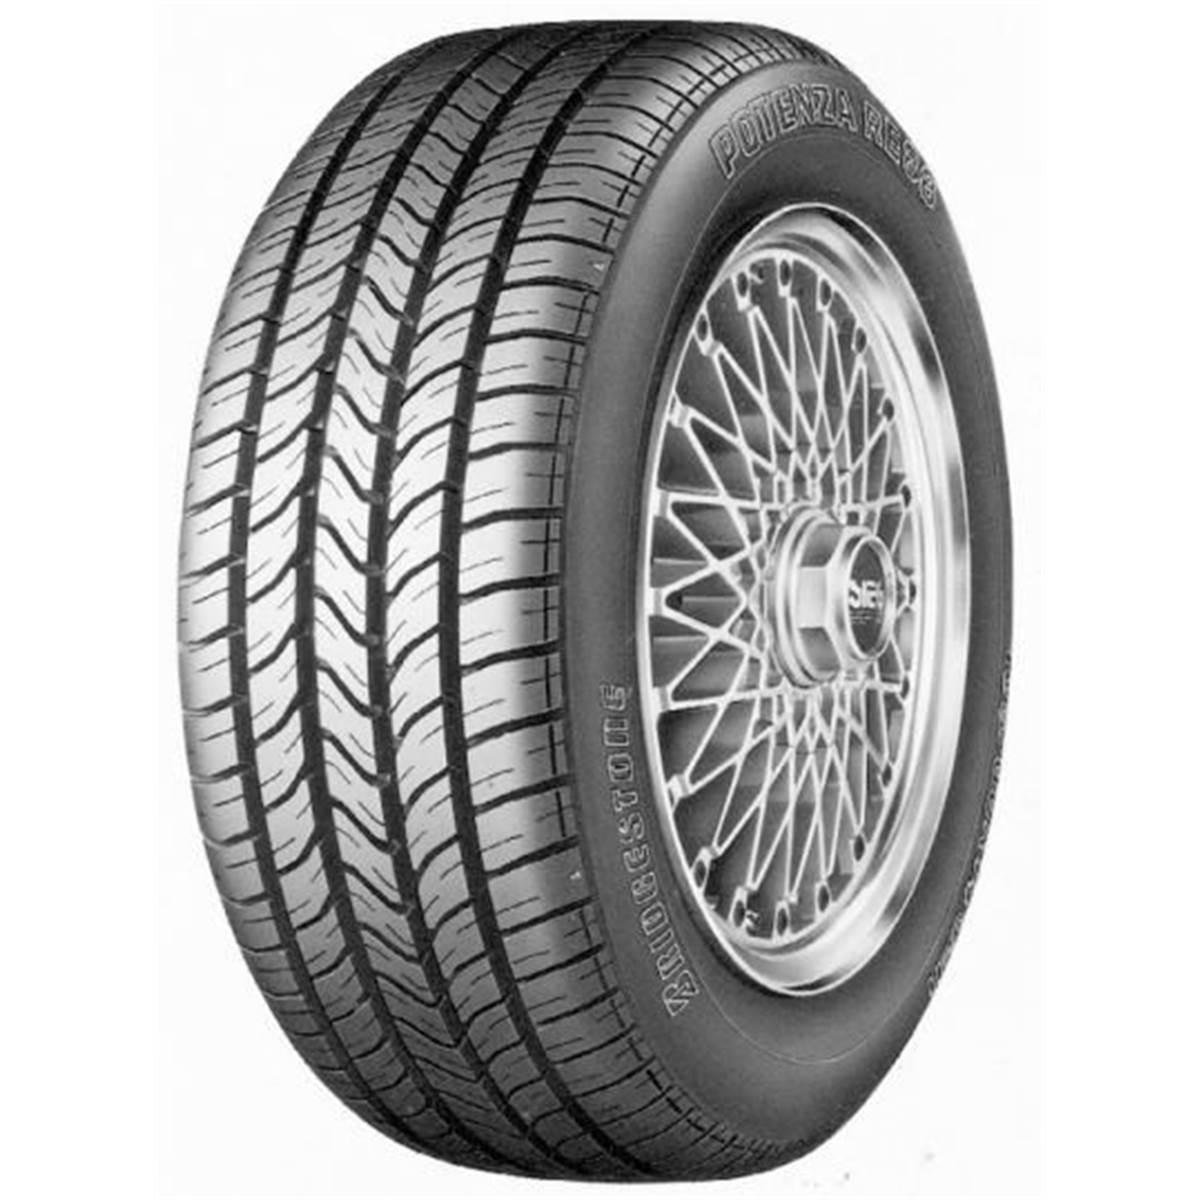 Pneu Bridgestone 175/60R14 79H Potenza Re88